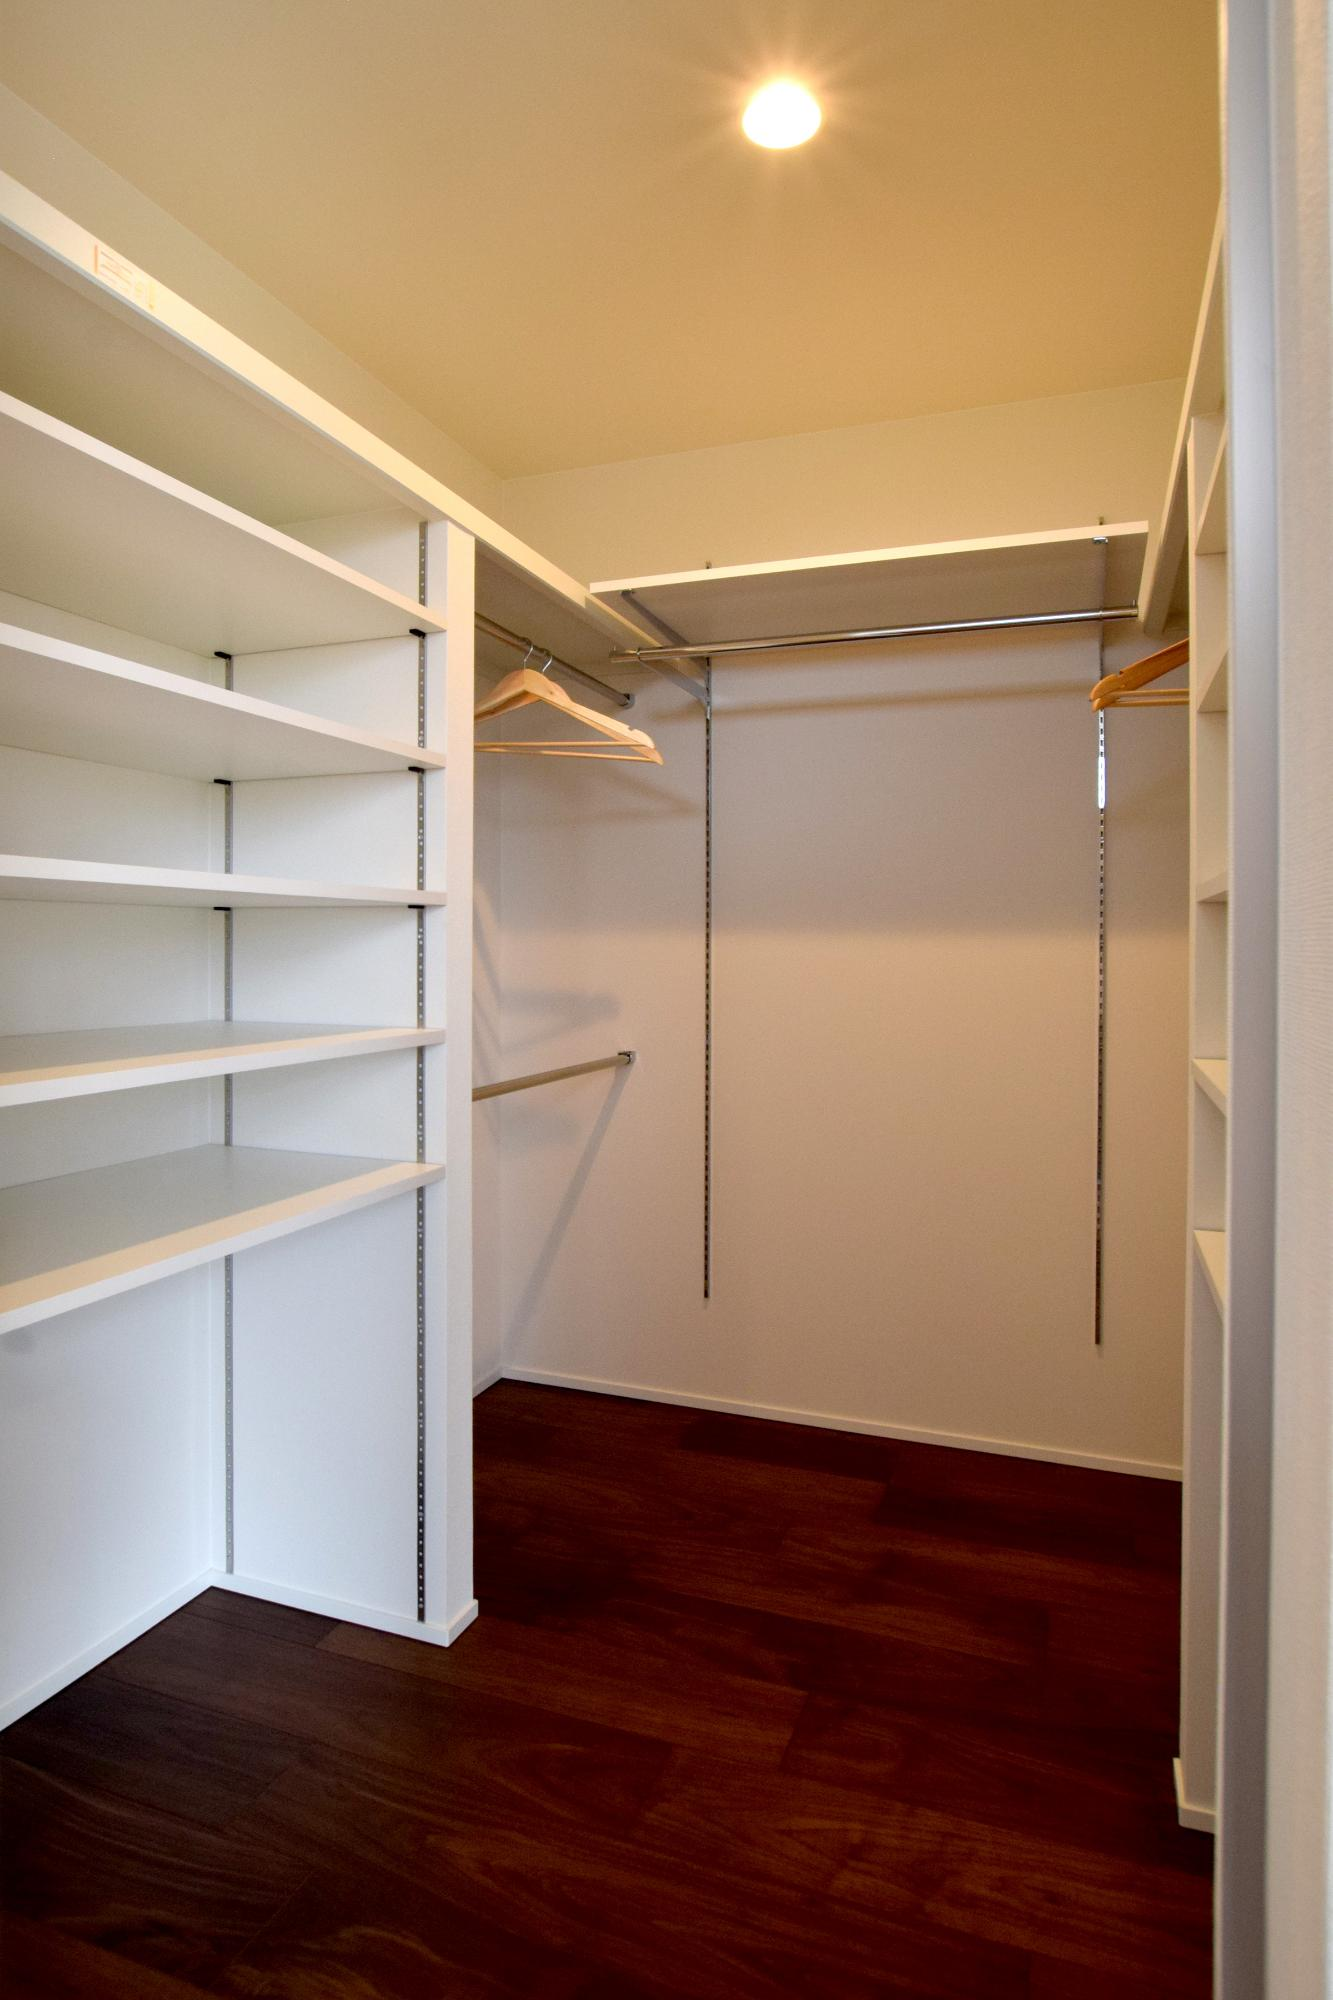 DETAIL HOME(ディテールホーム)「充実収納のスタイリッシュハウス」のモダン・和風・和モダンな収納スペースの実例写真